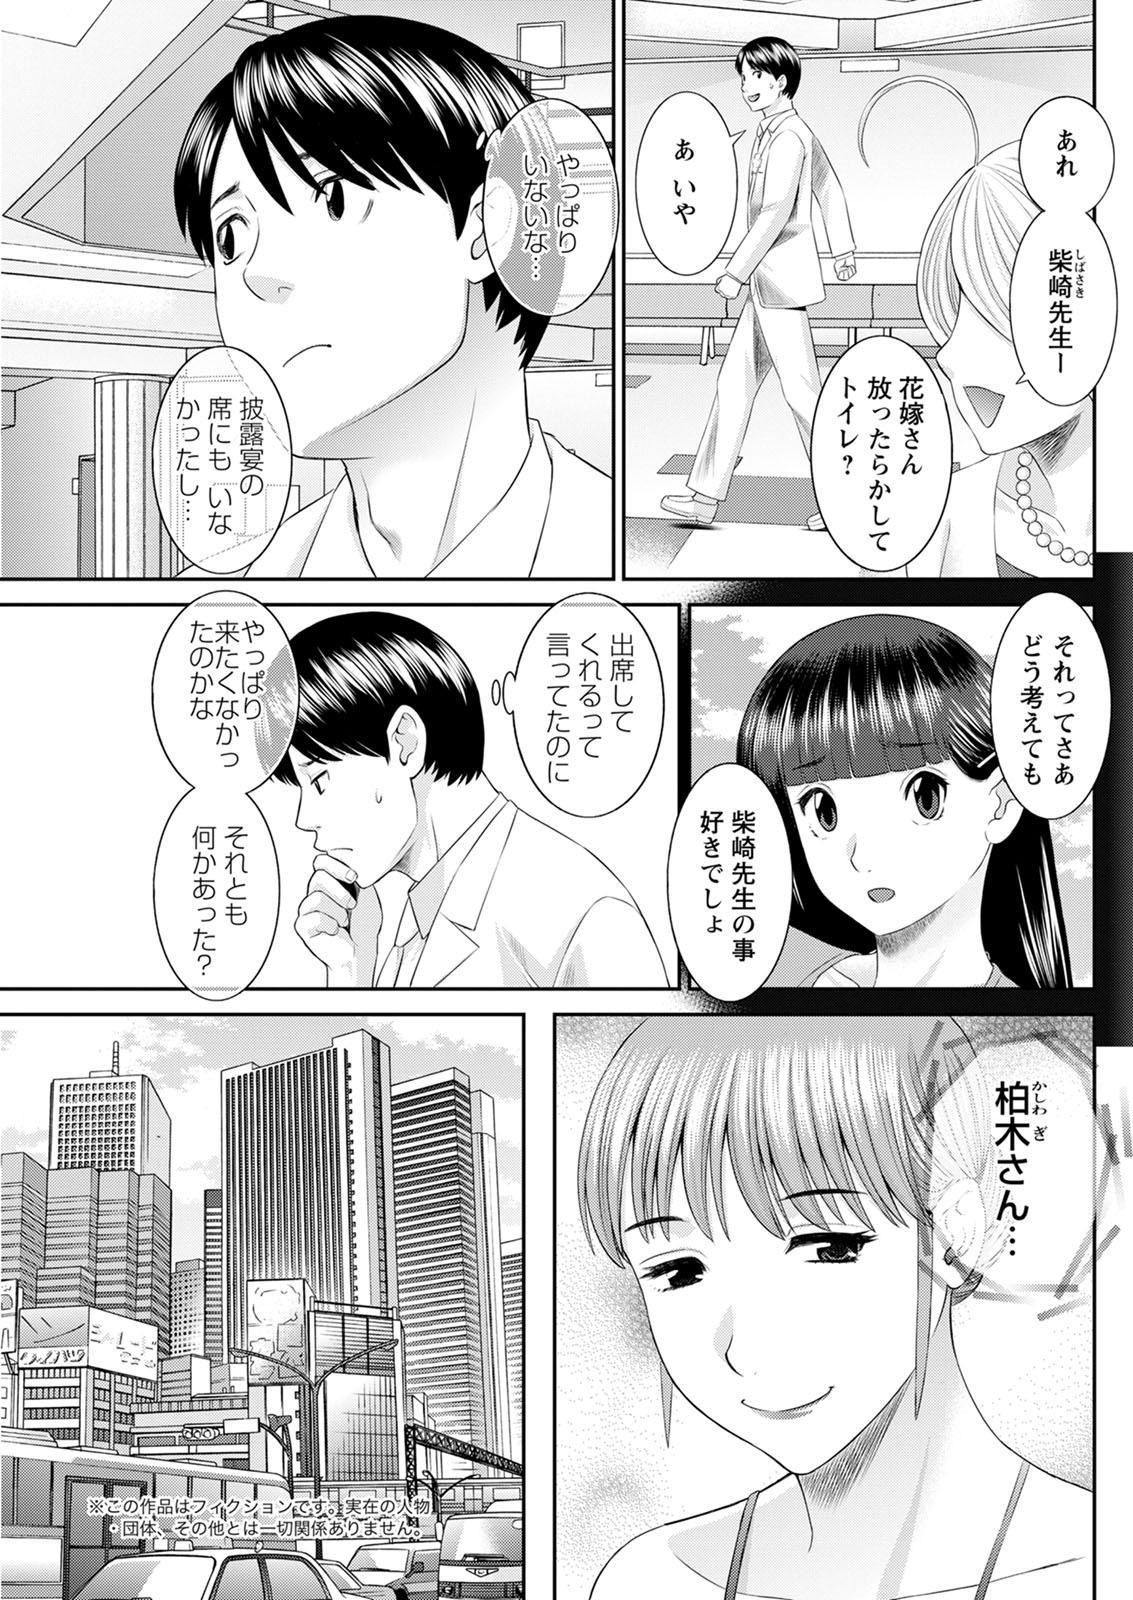 [Kawamori Misaki] Kaikan Hitotsuma Gakuen Ch. 1-6, 8-20 [Digital] 335